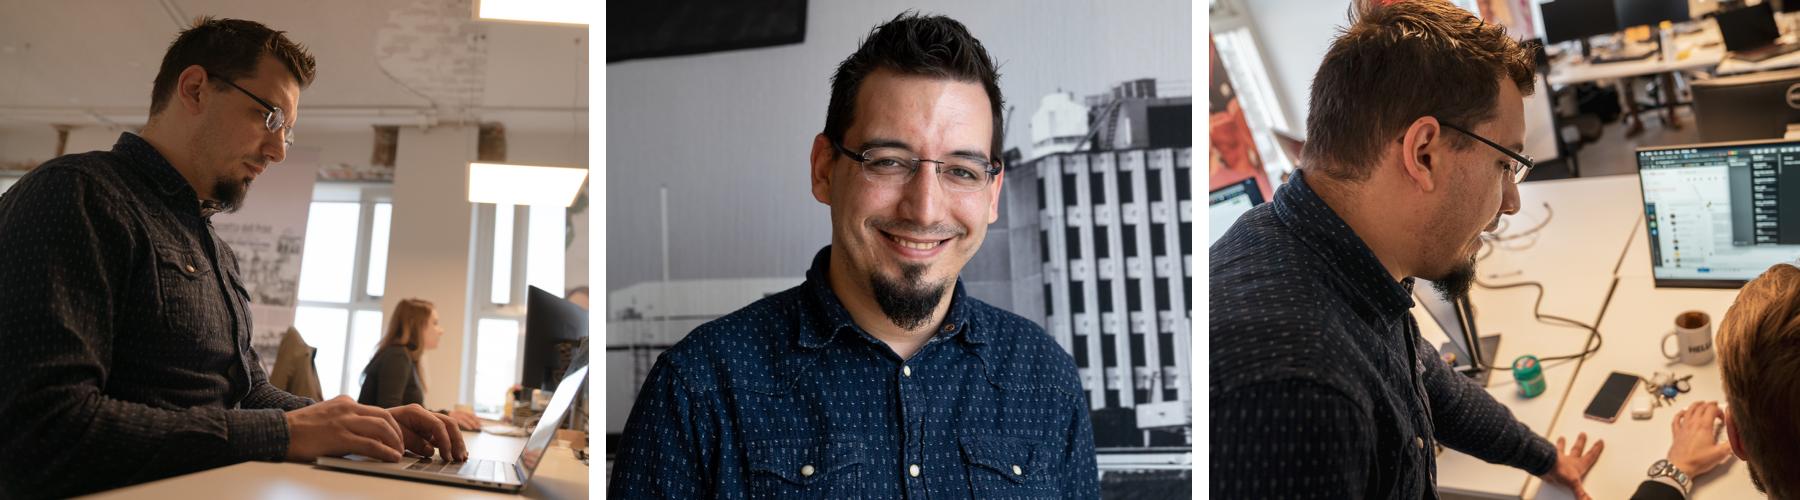 HelloExperts – Meet Dragan, Product Owner @ Helloprint